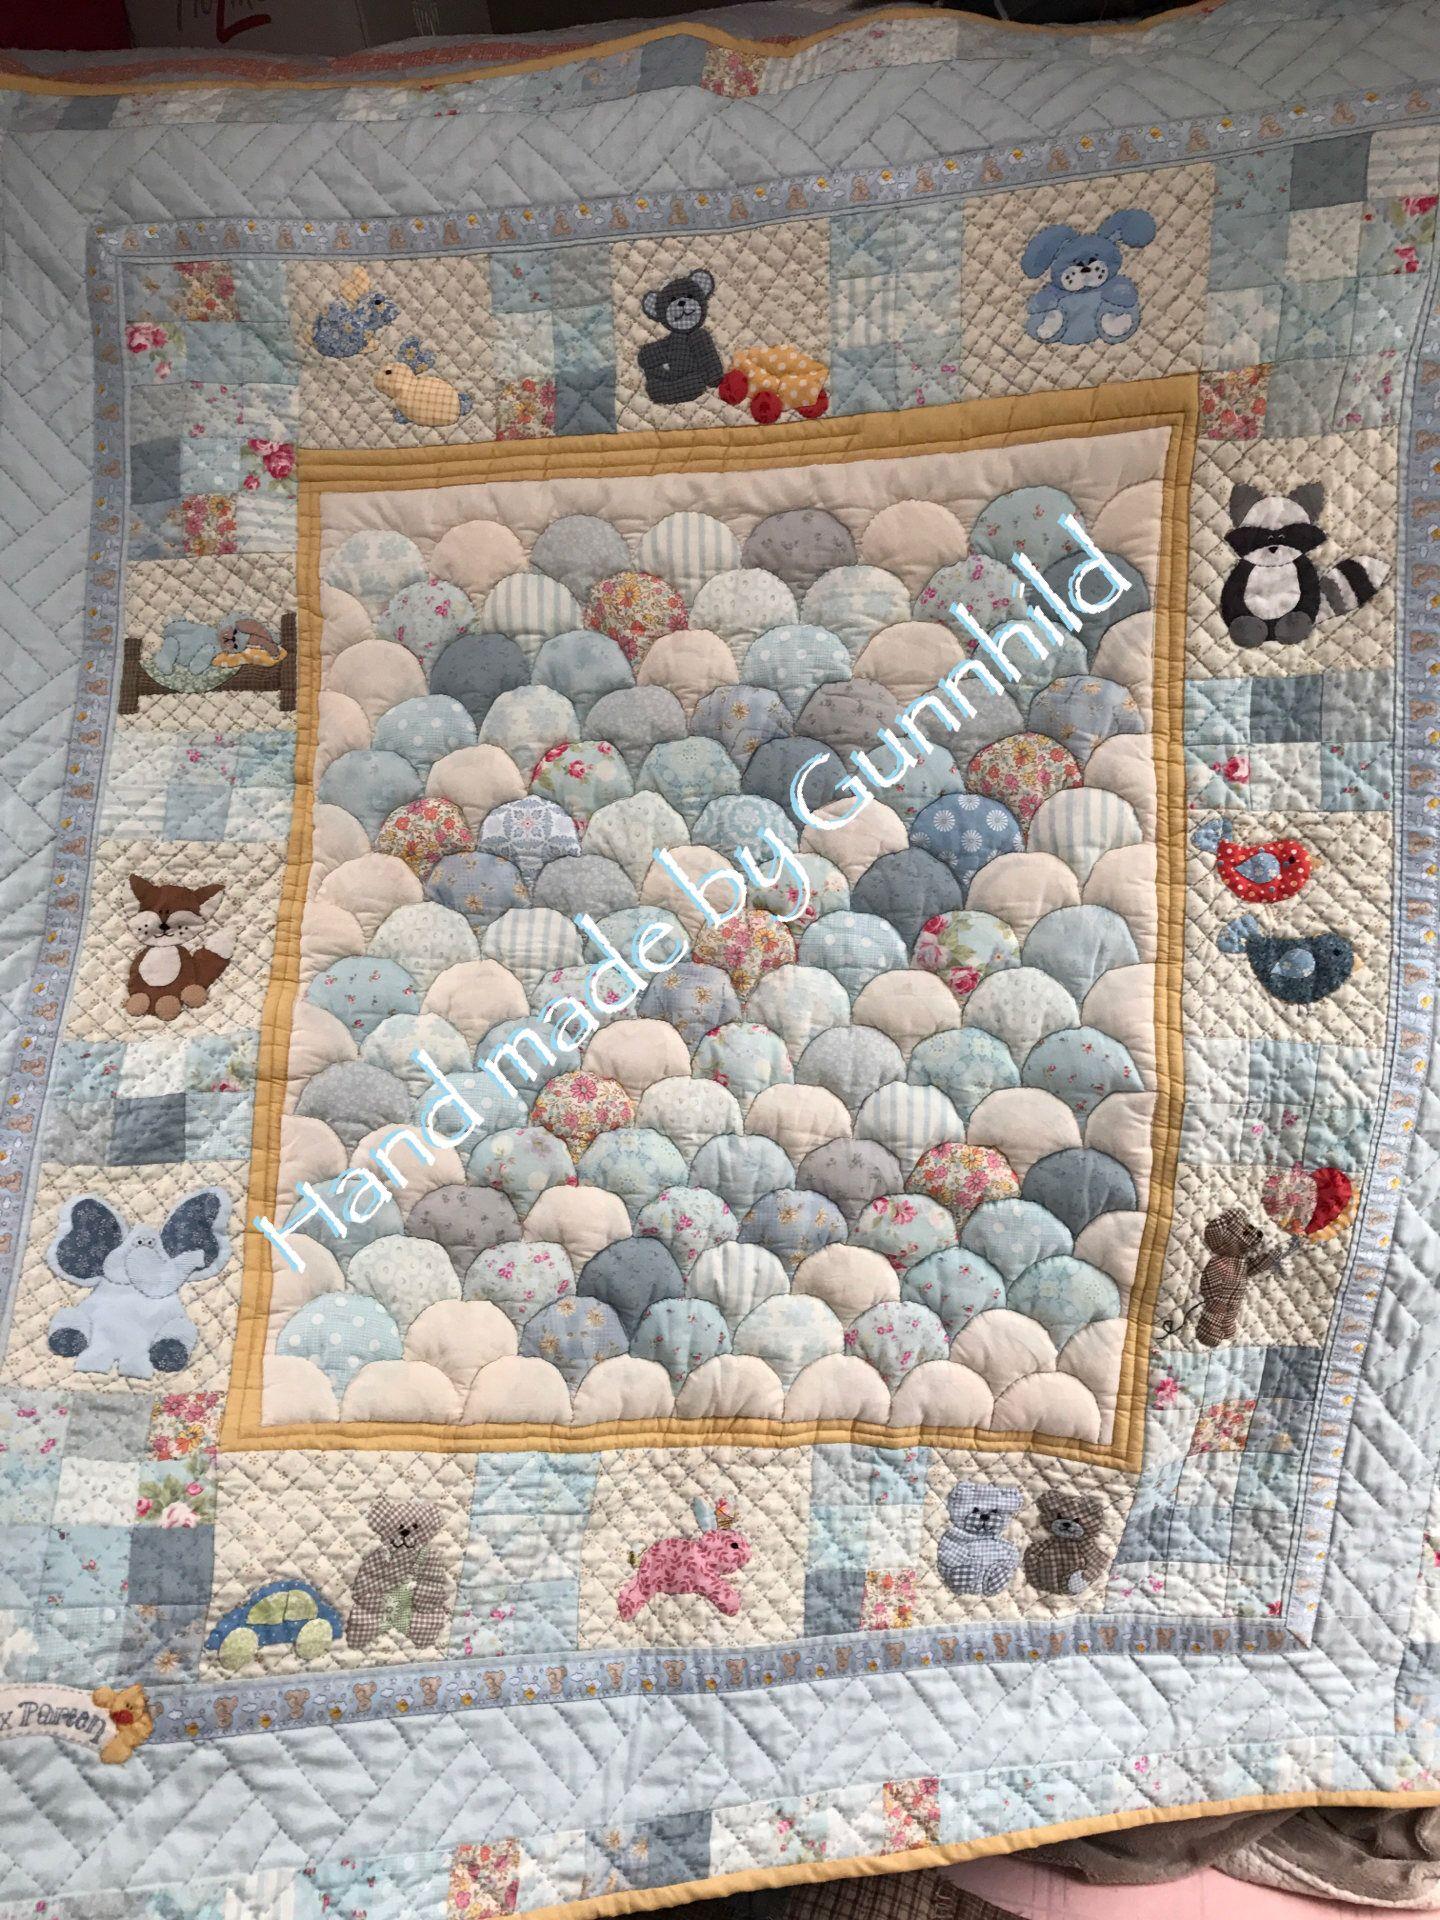 Krabbeteppet Eventyrquilt /Crib quilt Fairytale -PDF mønster/pattern, Hand made by Gunnhild by GunnhildHLeeredesign on Etsy https://www.etsy.com/no-en/listing/564351157/krabbeteppet-eventyrquilt-crib-quilt